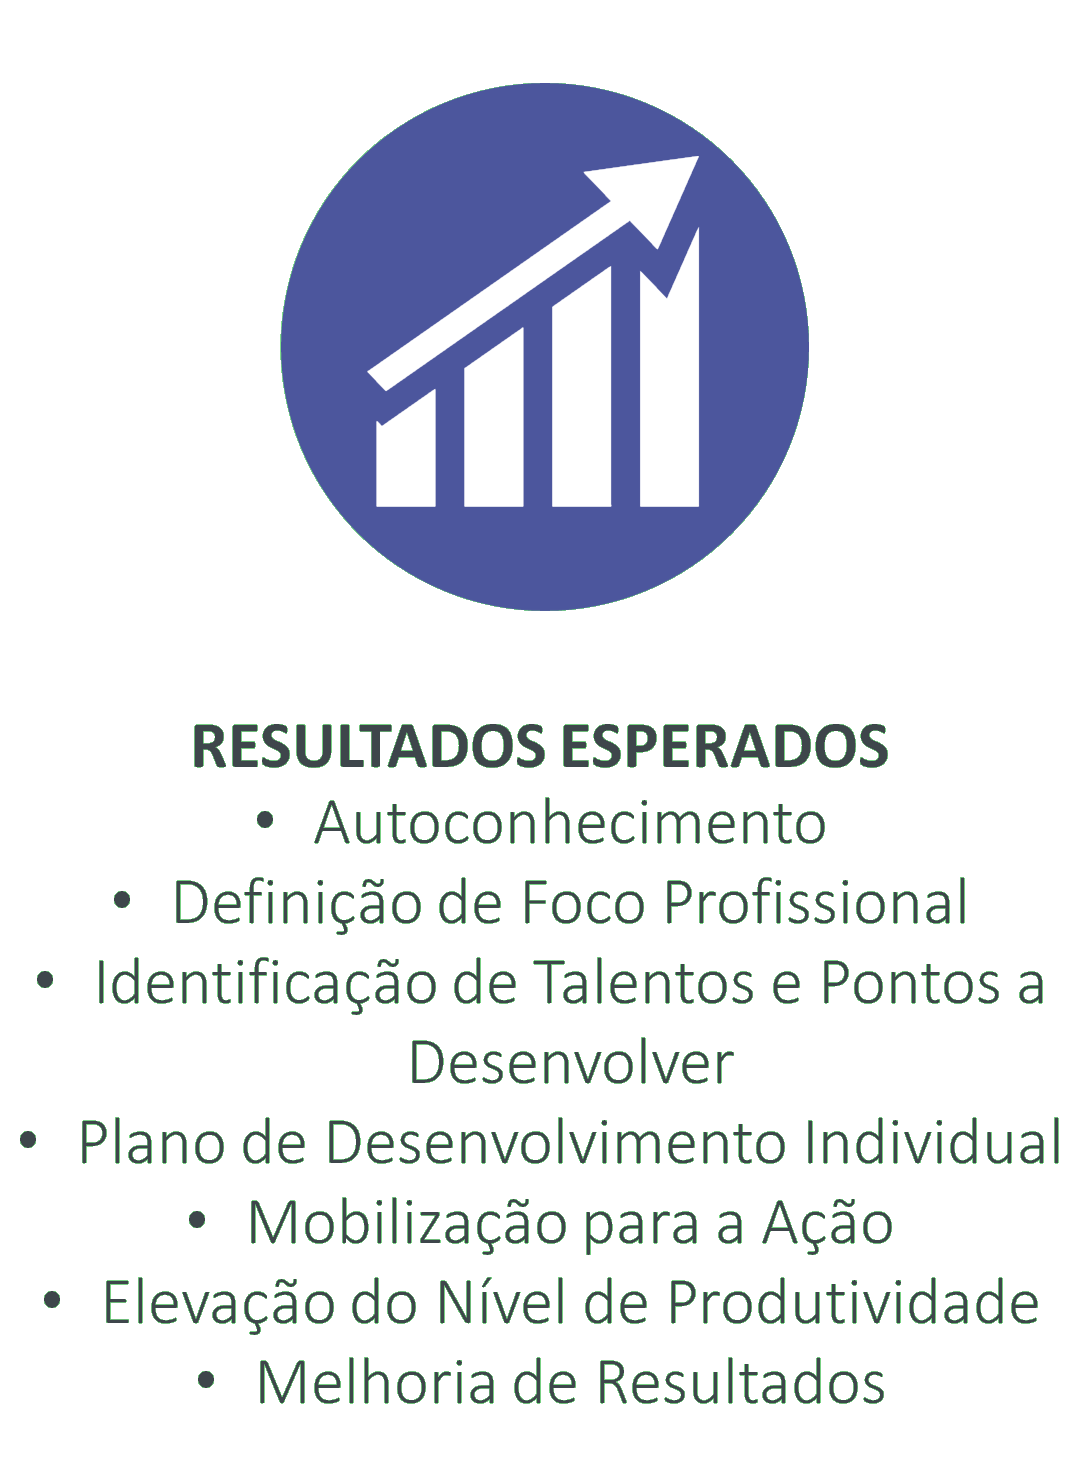 03_joao_carlos_rocha-_-90dias_resultados_esperados_tranparente